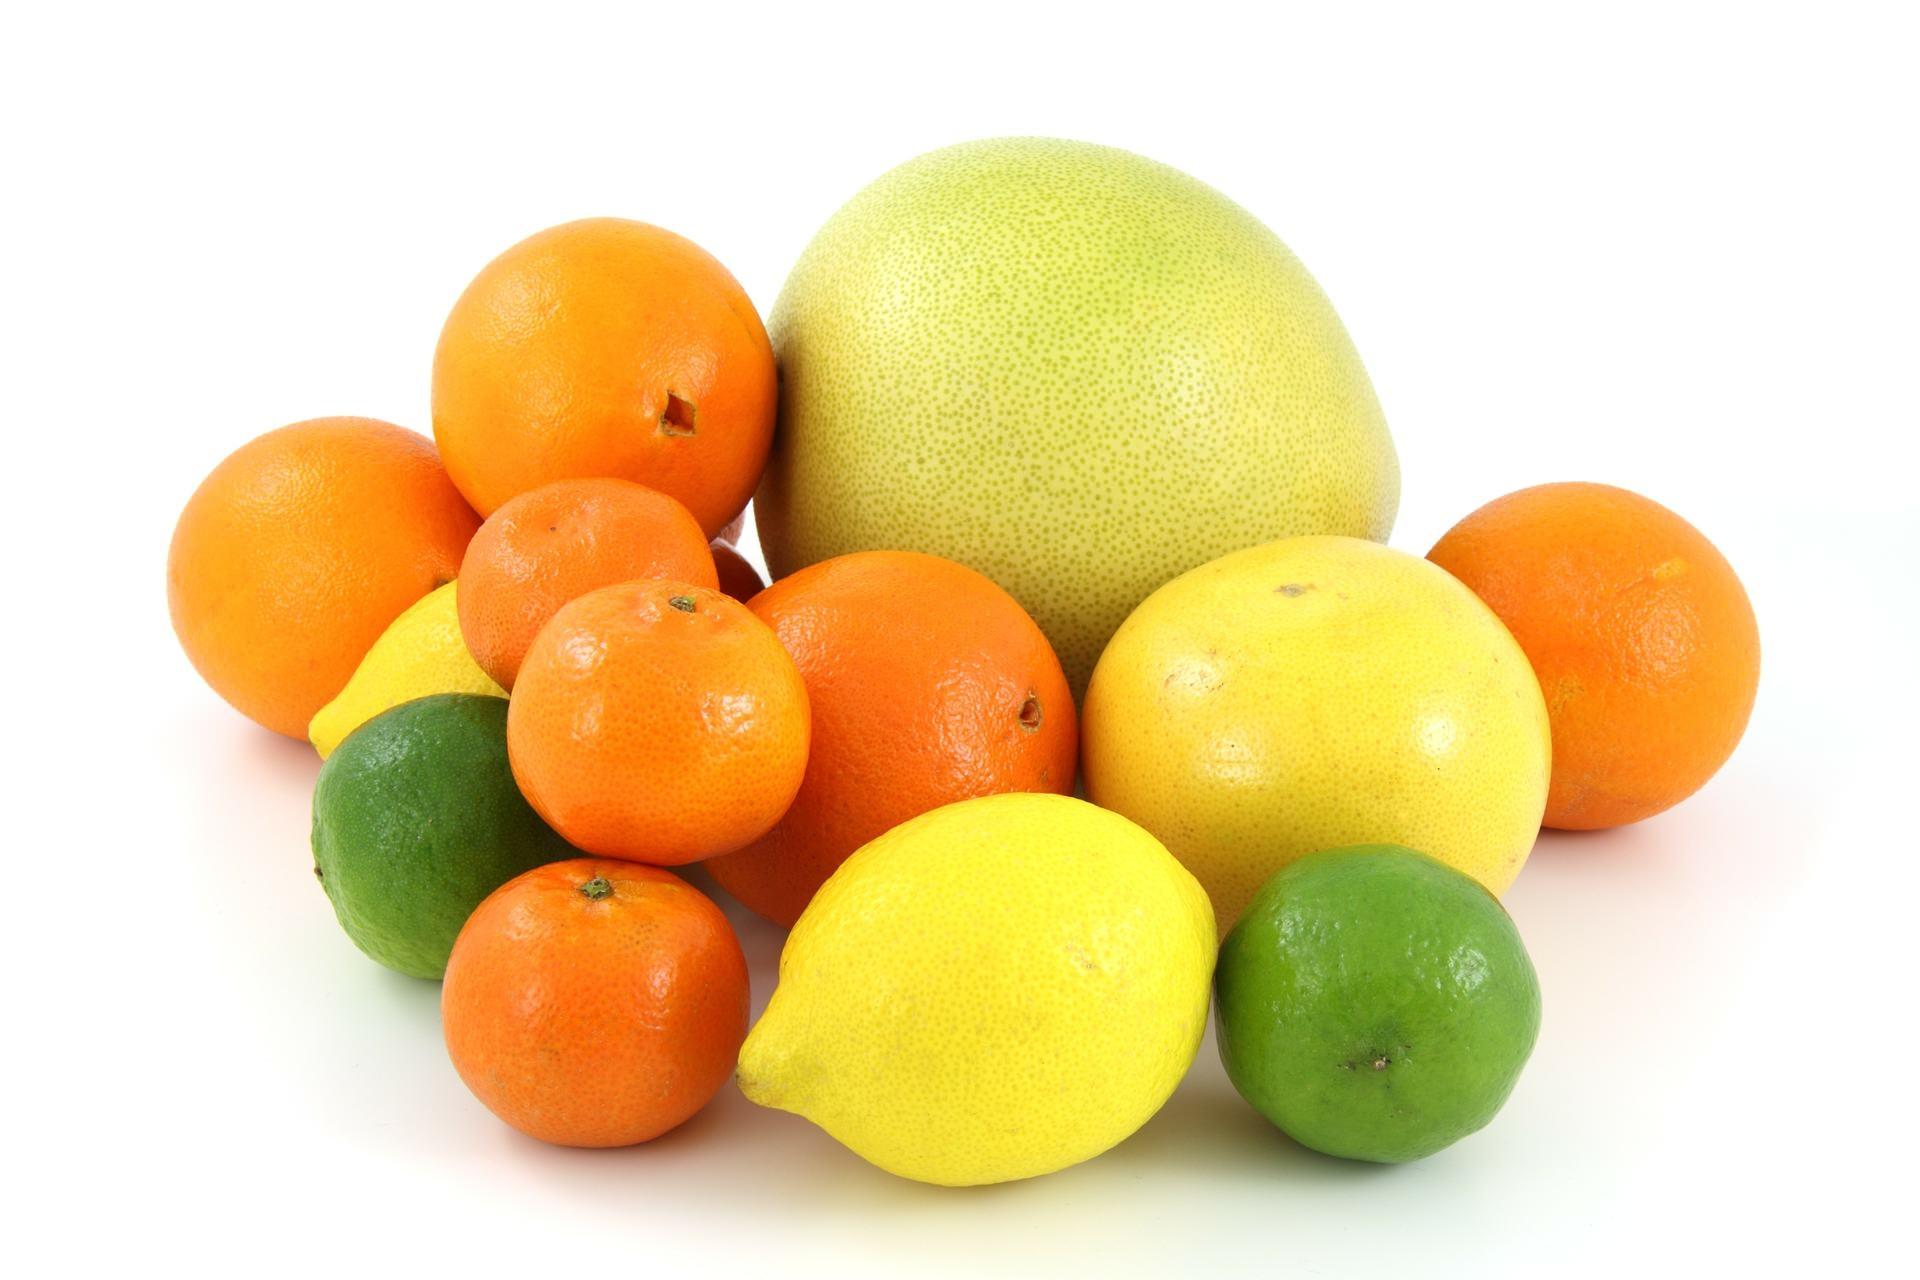 1432032787-fruit-15408_1920-K4l-1920x1280-MM-100